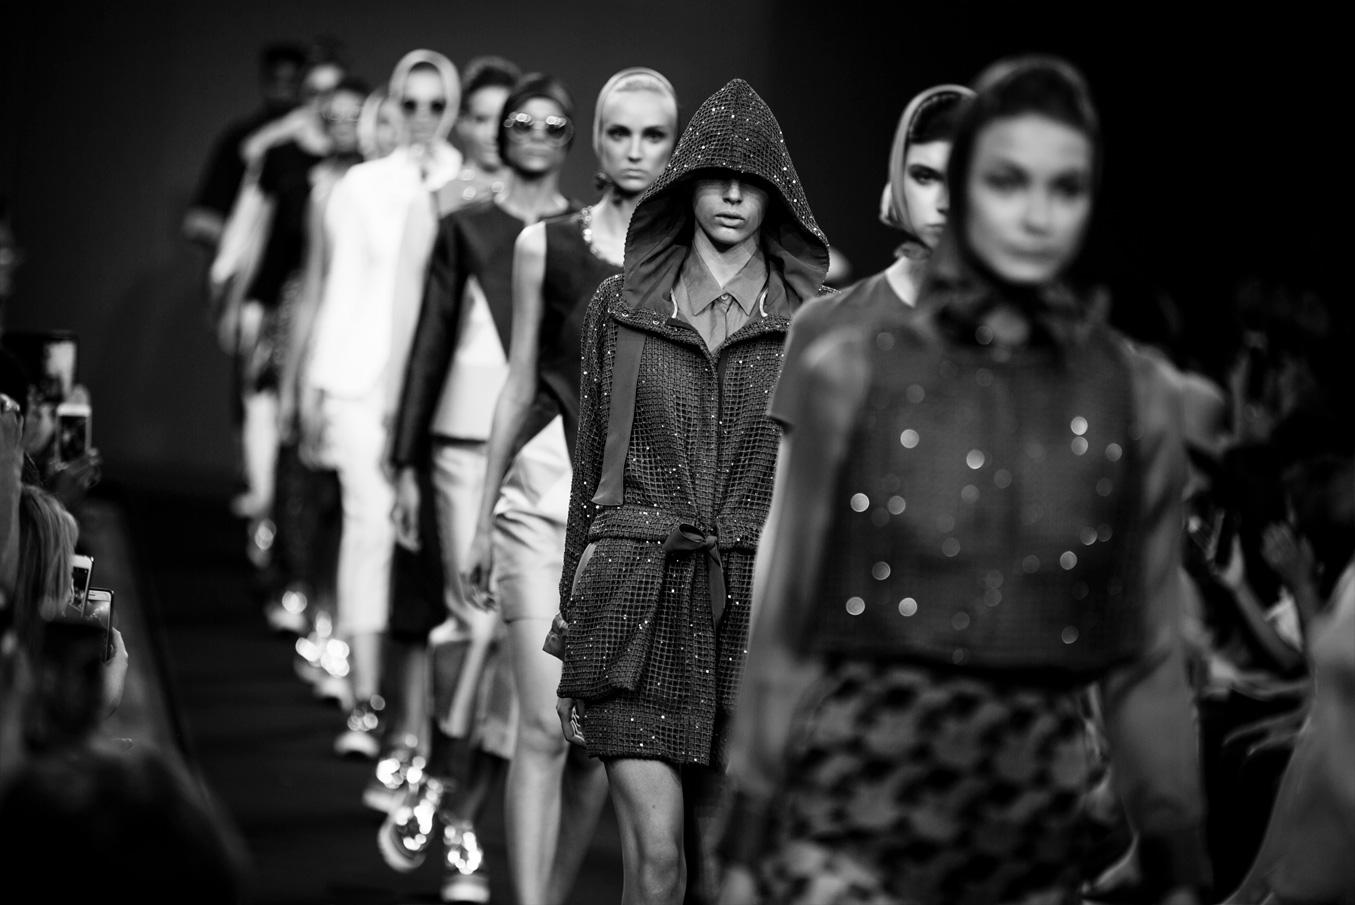 Fashion on catwalk